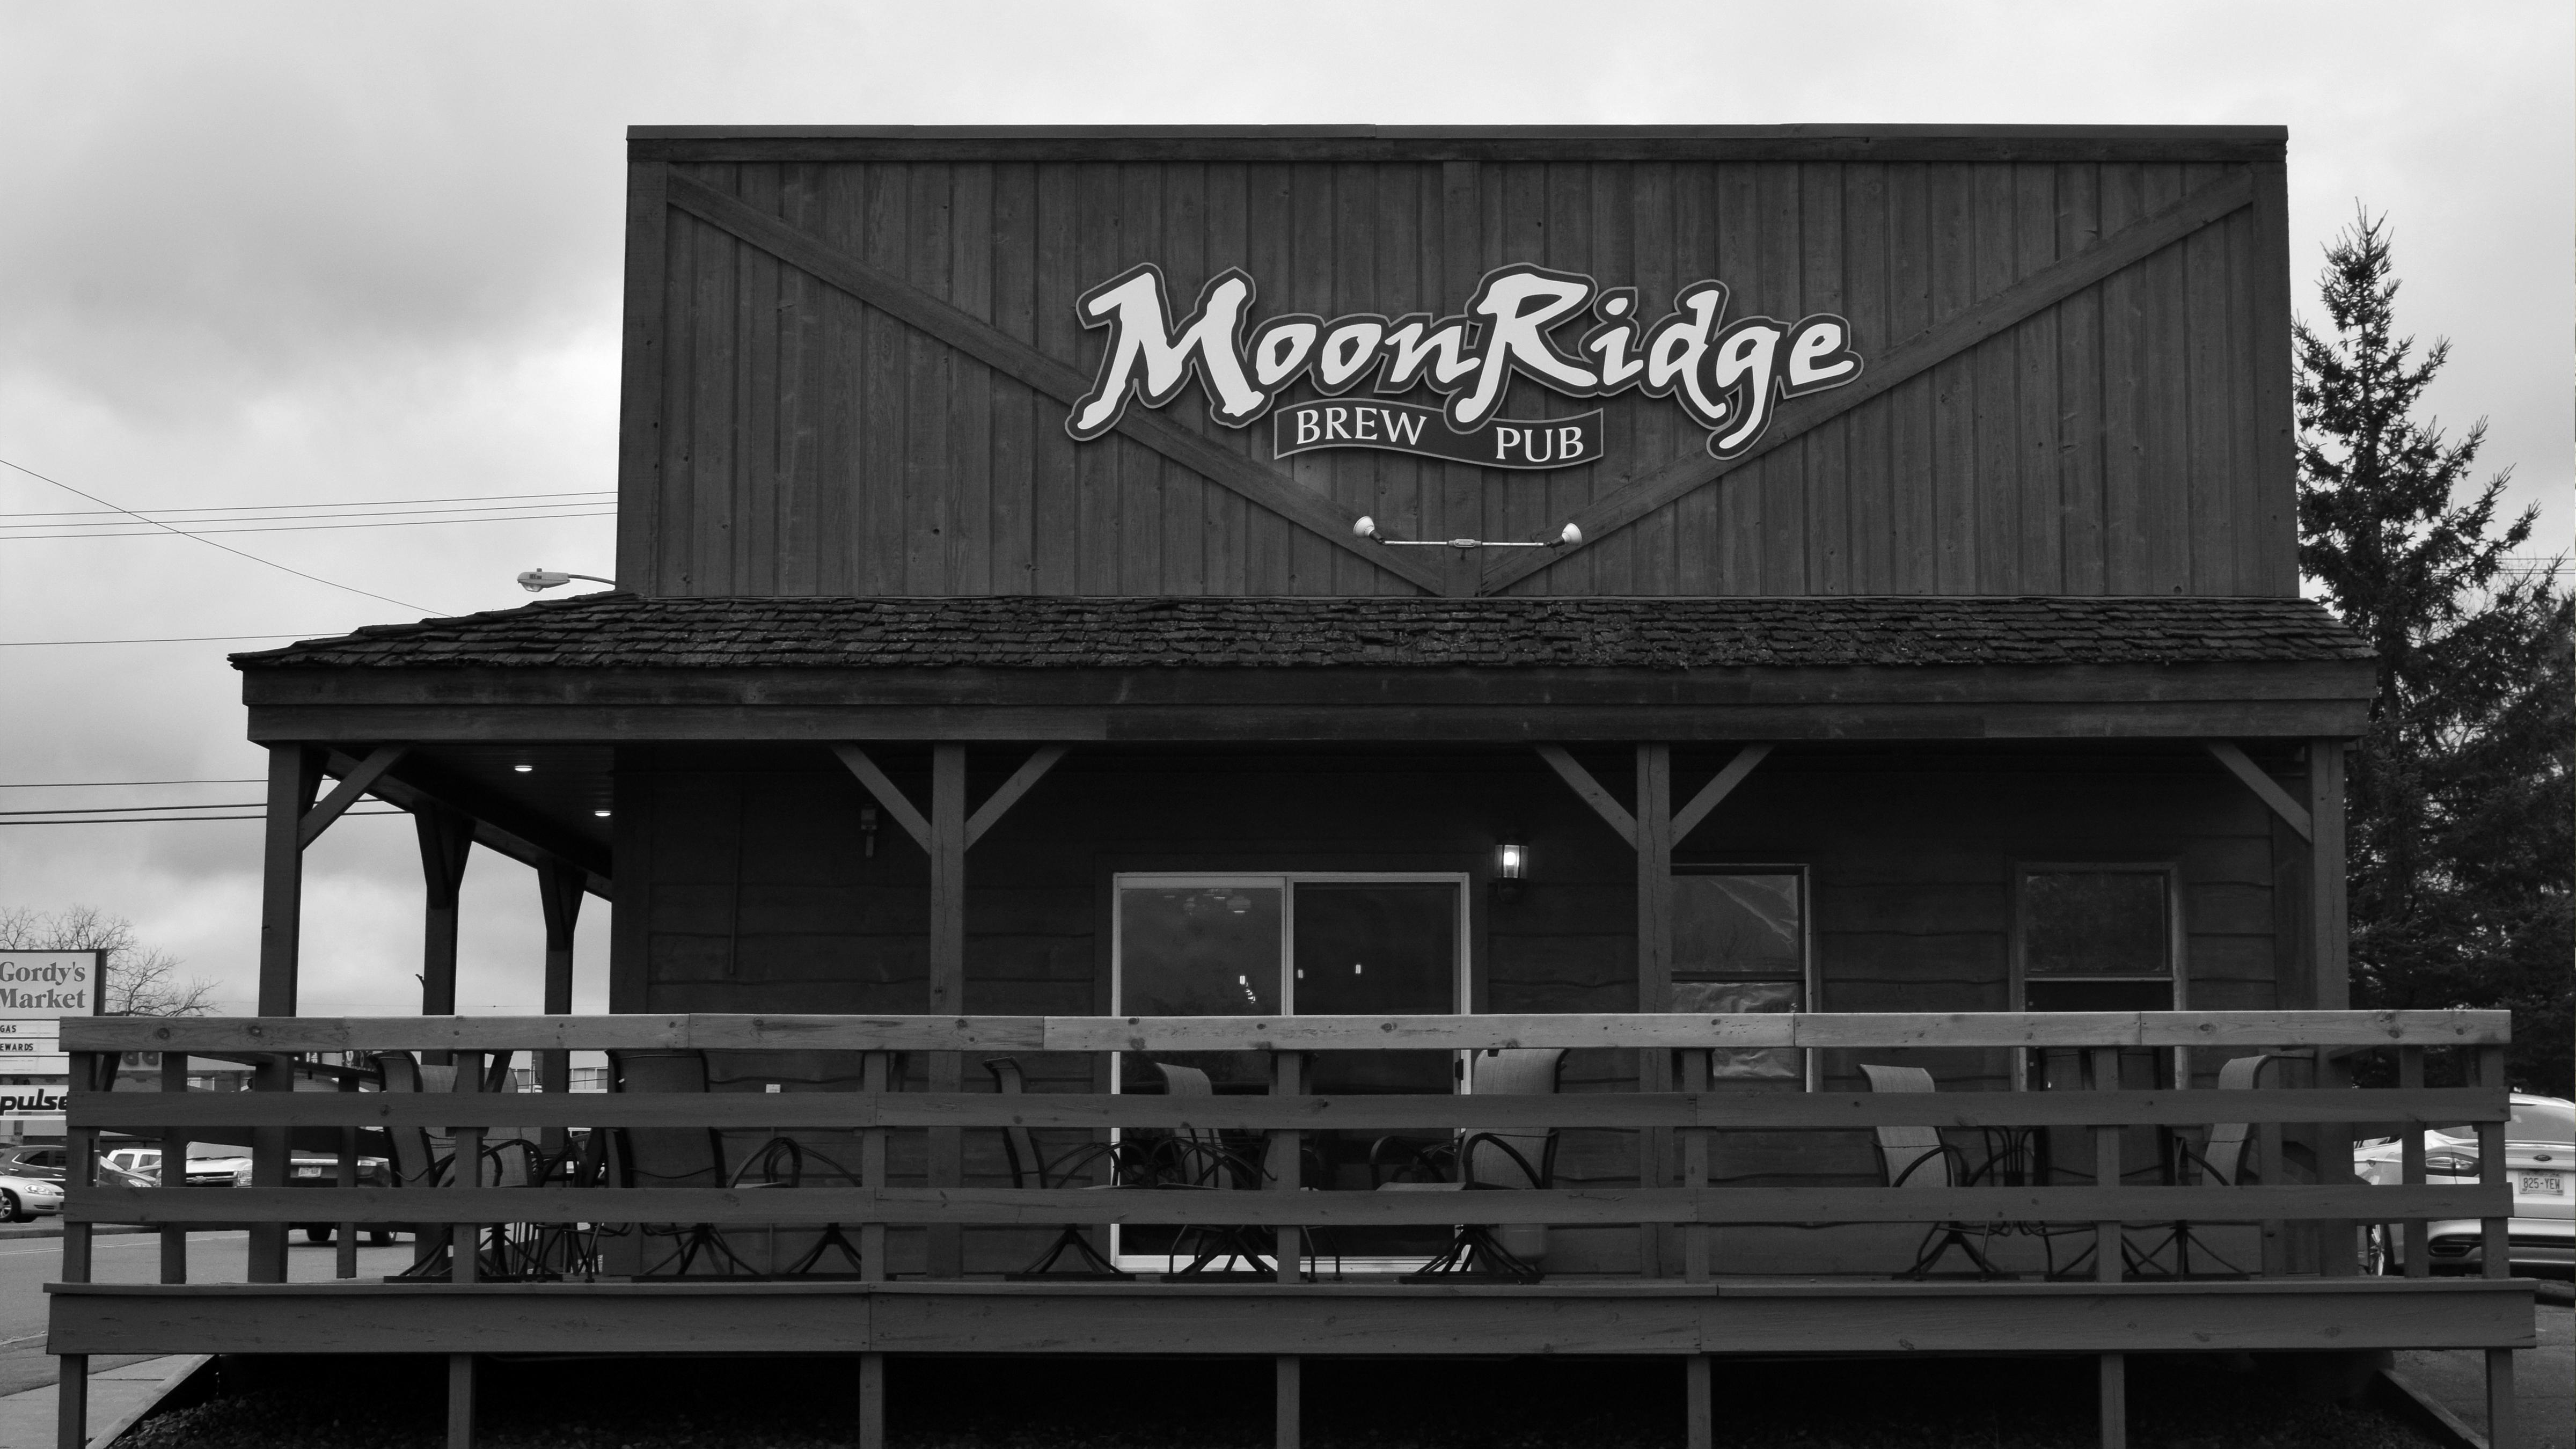 Moonridge3